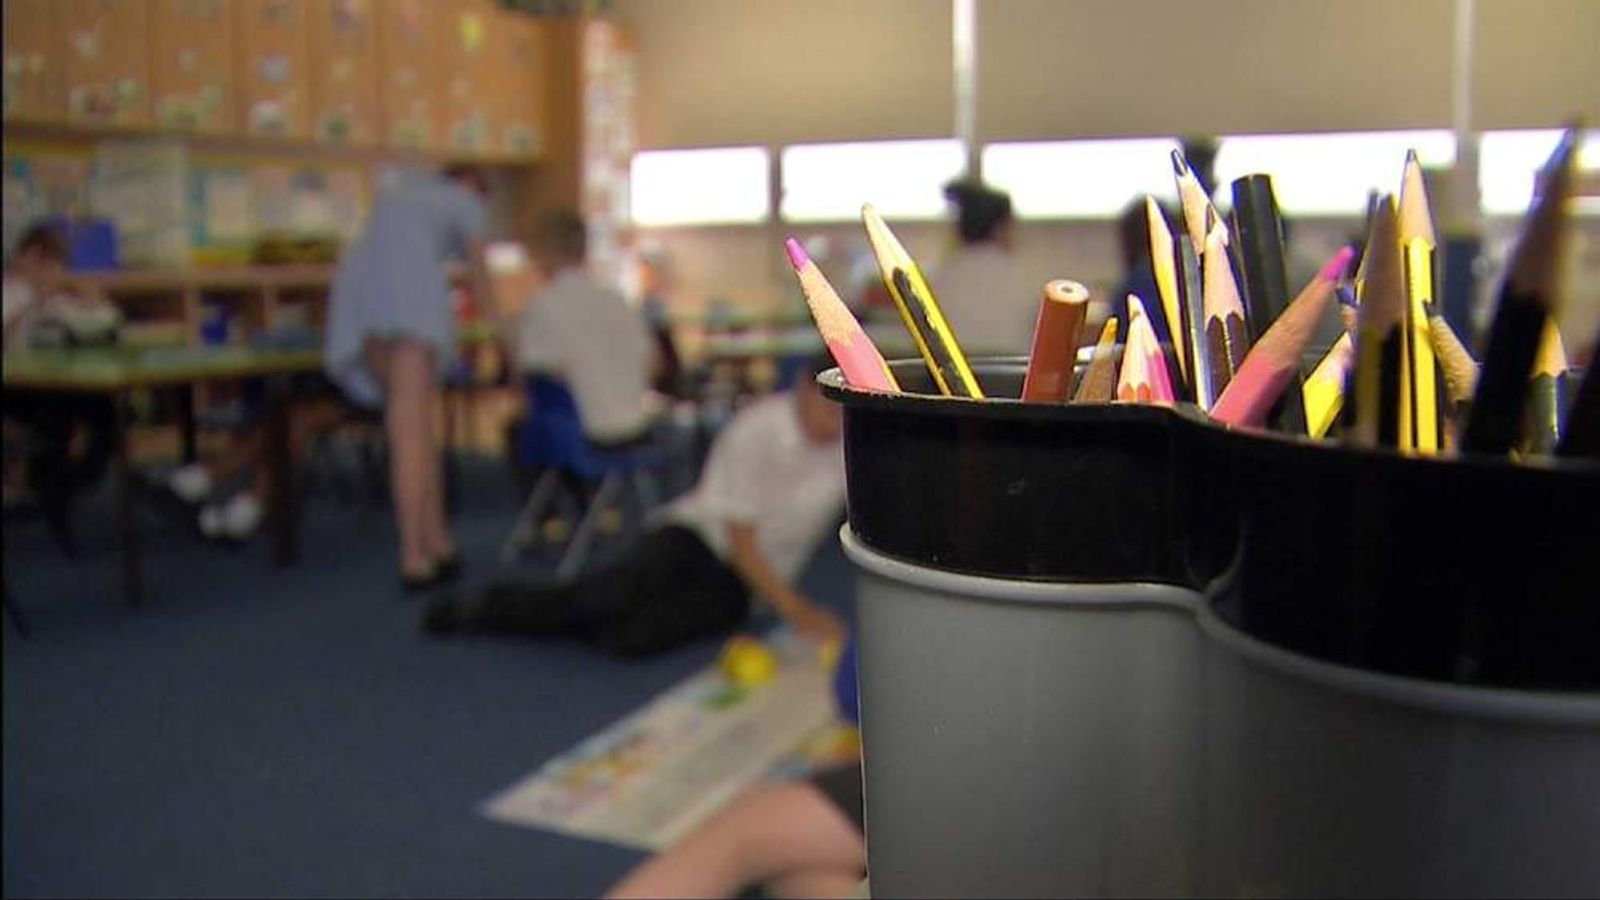 Generic Education School Classroom